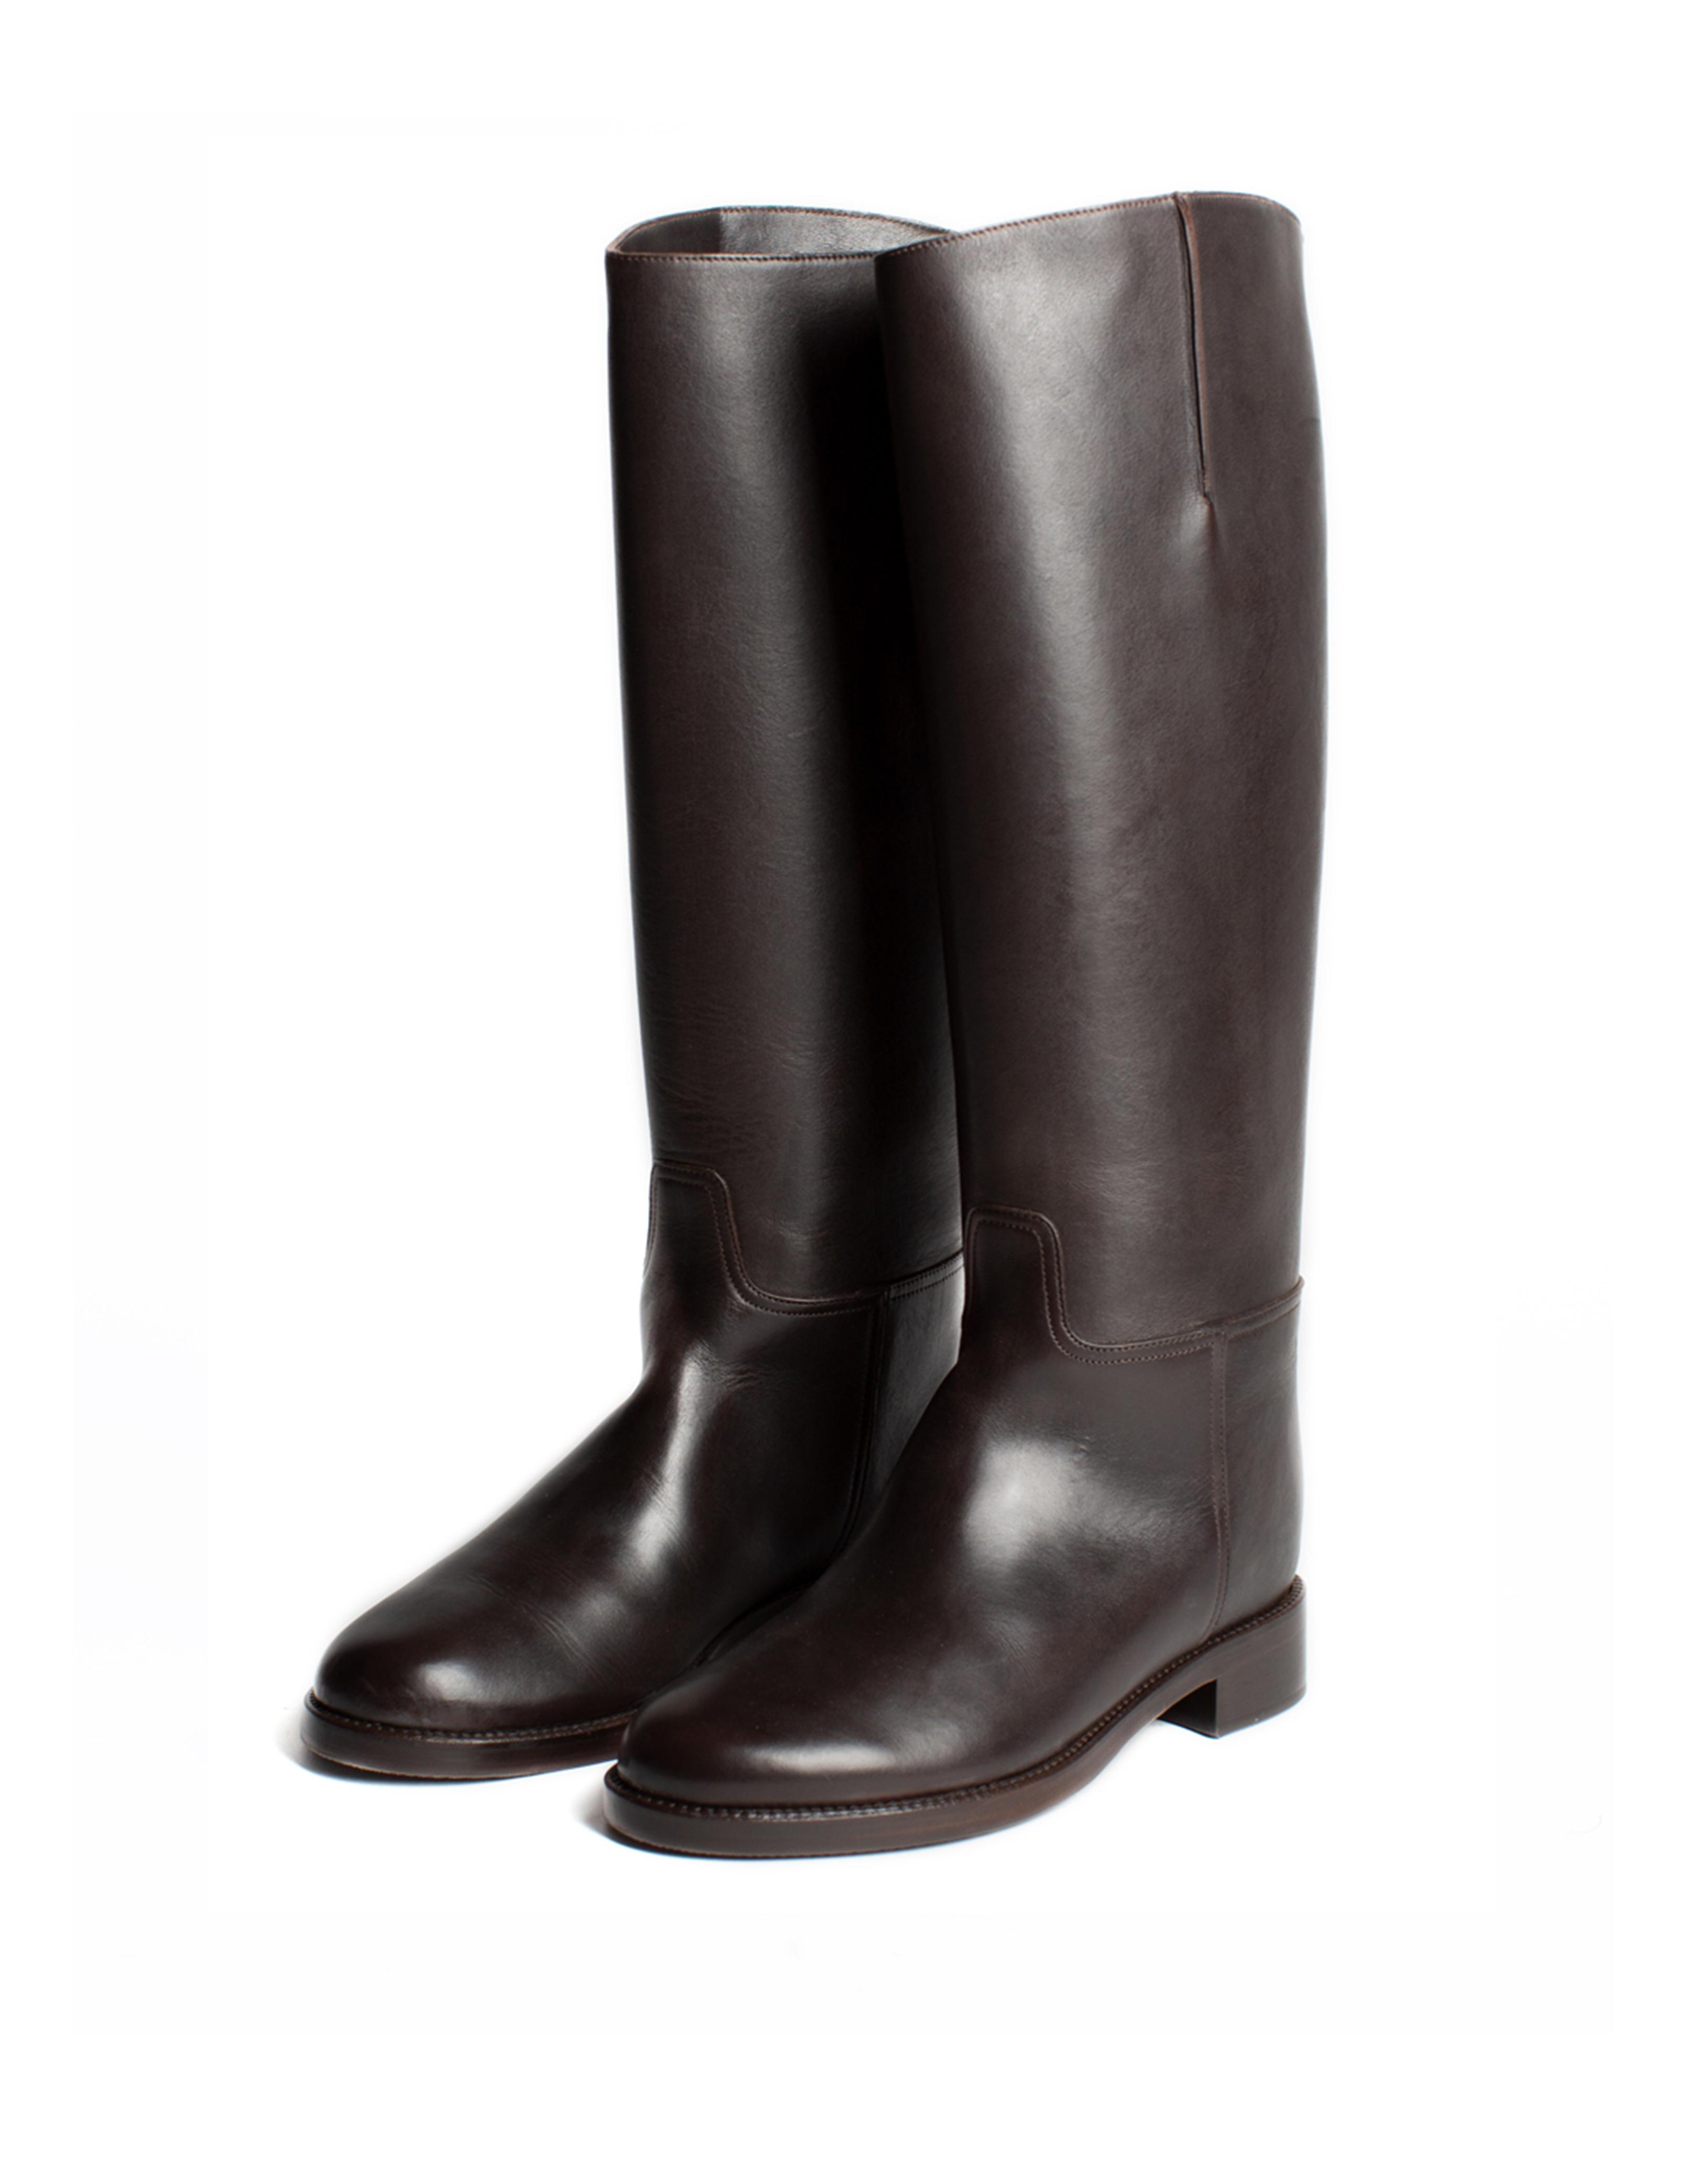 Riding Boots, dark brown